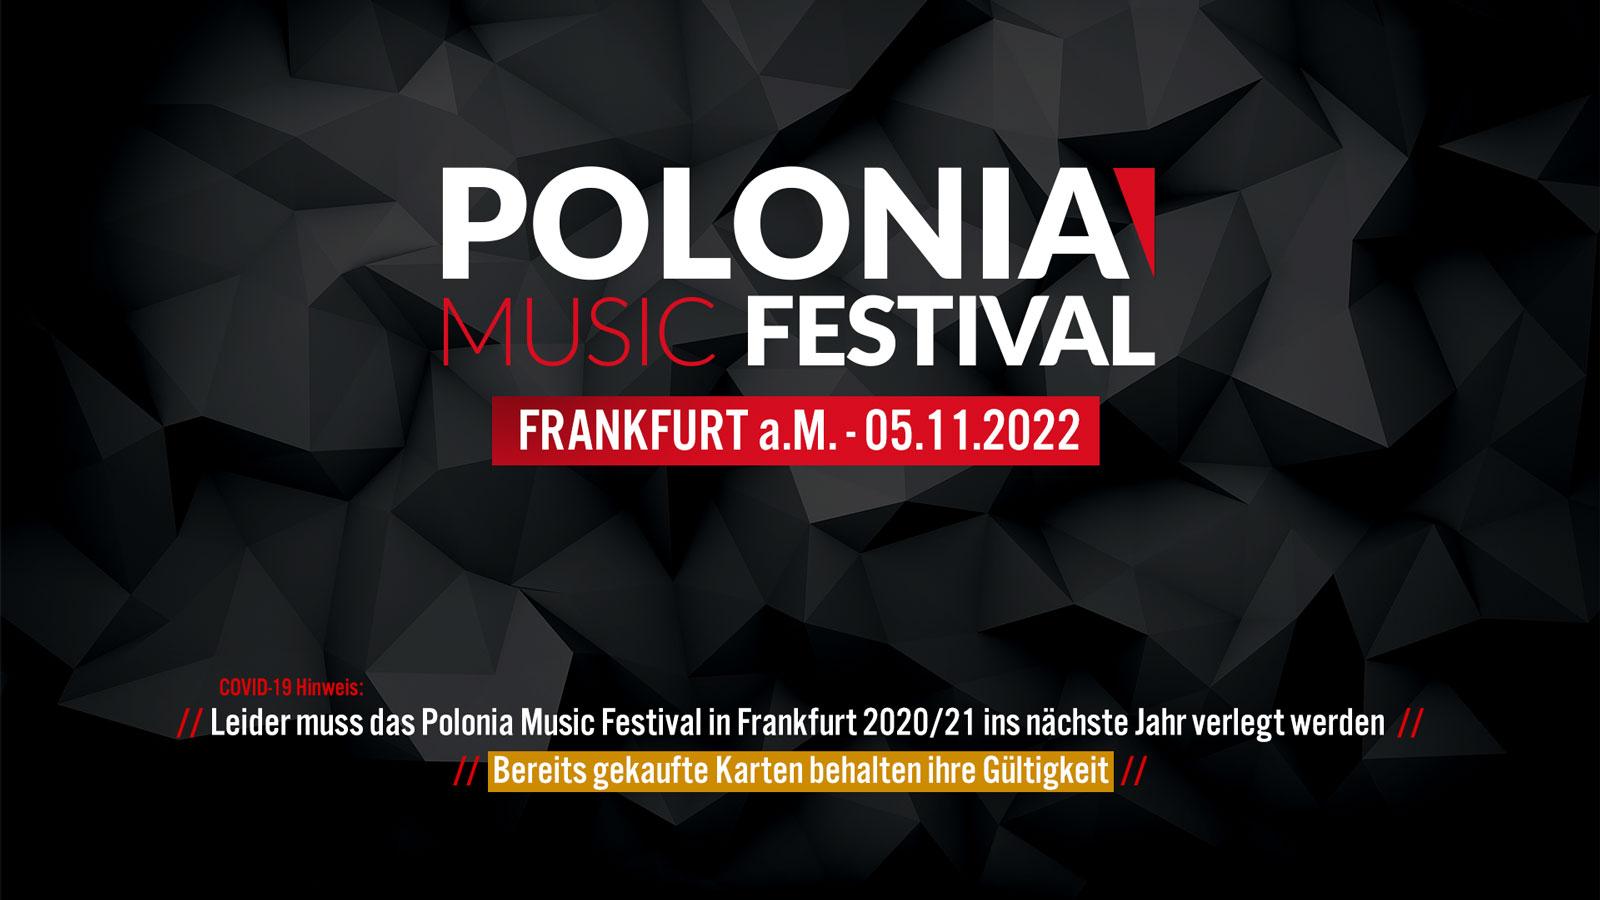 Polonia Music Festival Frankfurt 2022